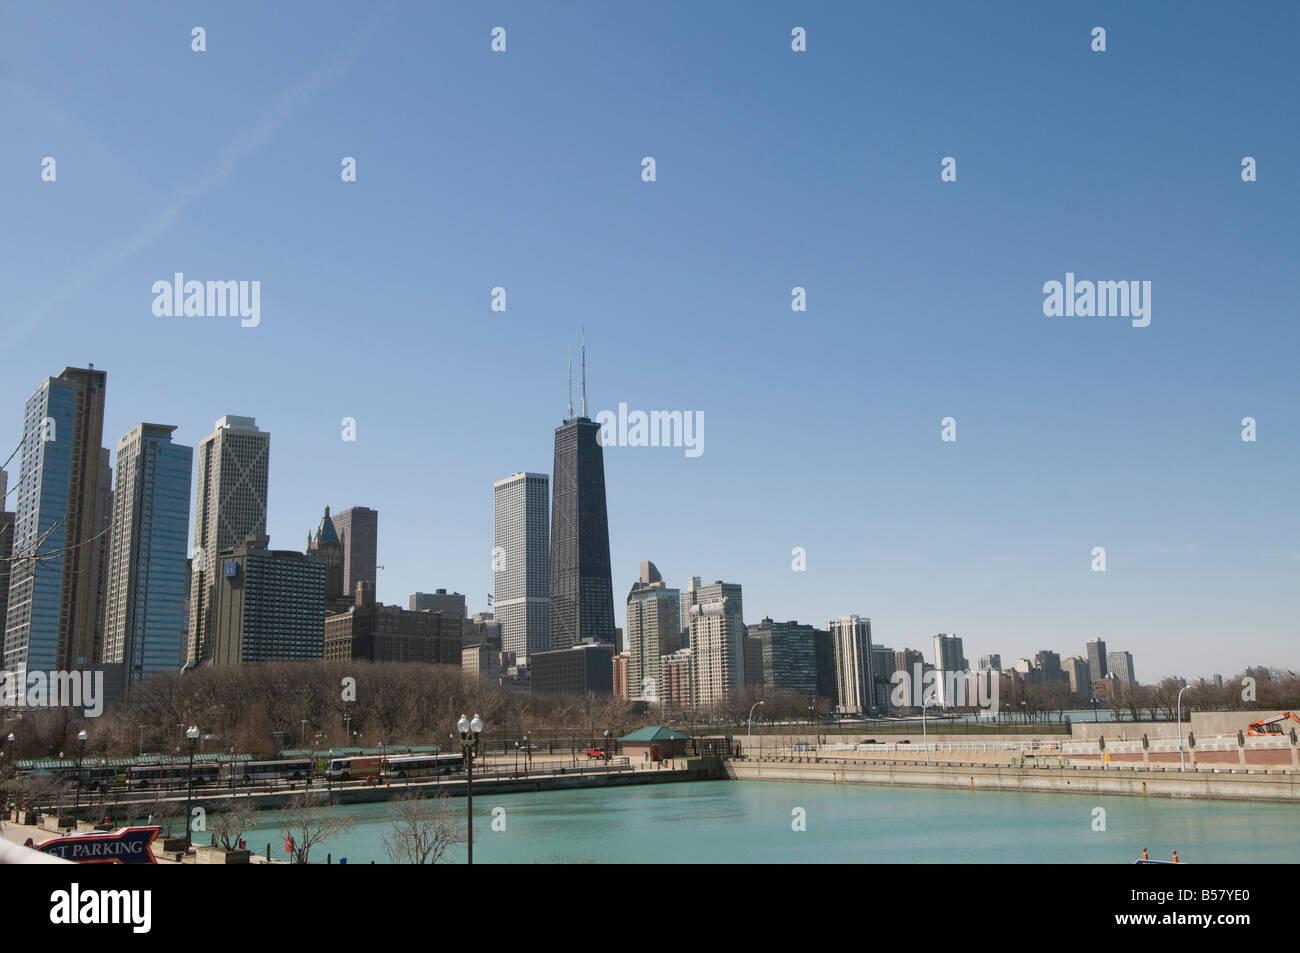 Chicago, Illinois, Estados Unidos de América, América del Norte Imagen De Stock